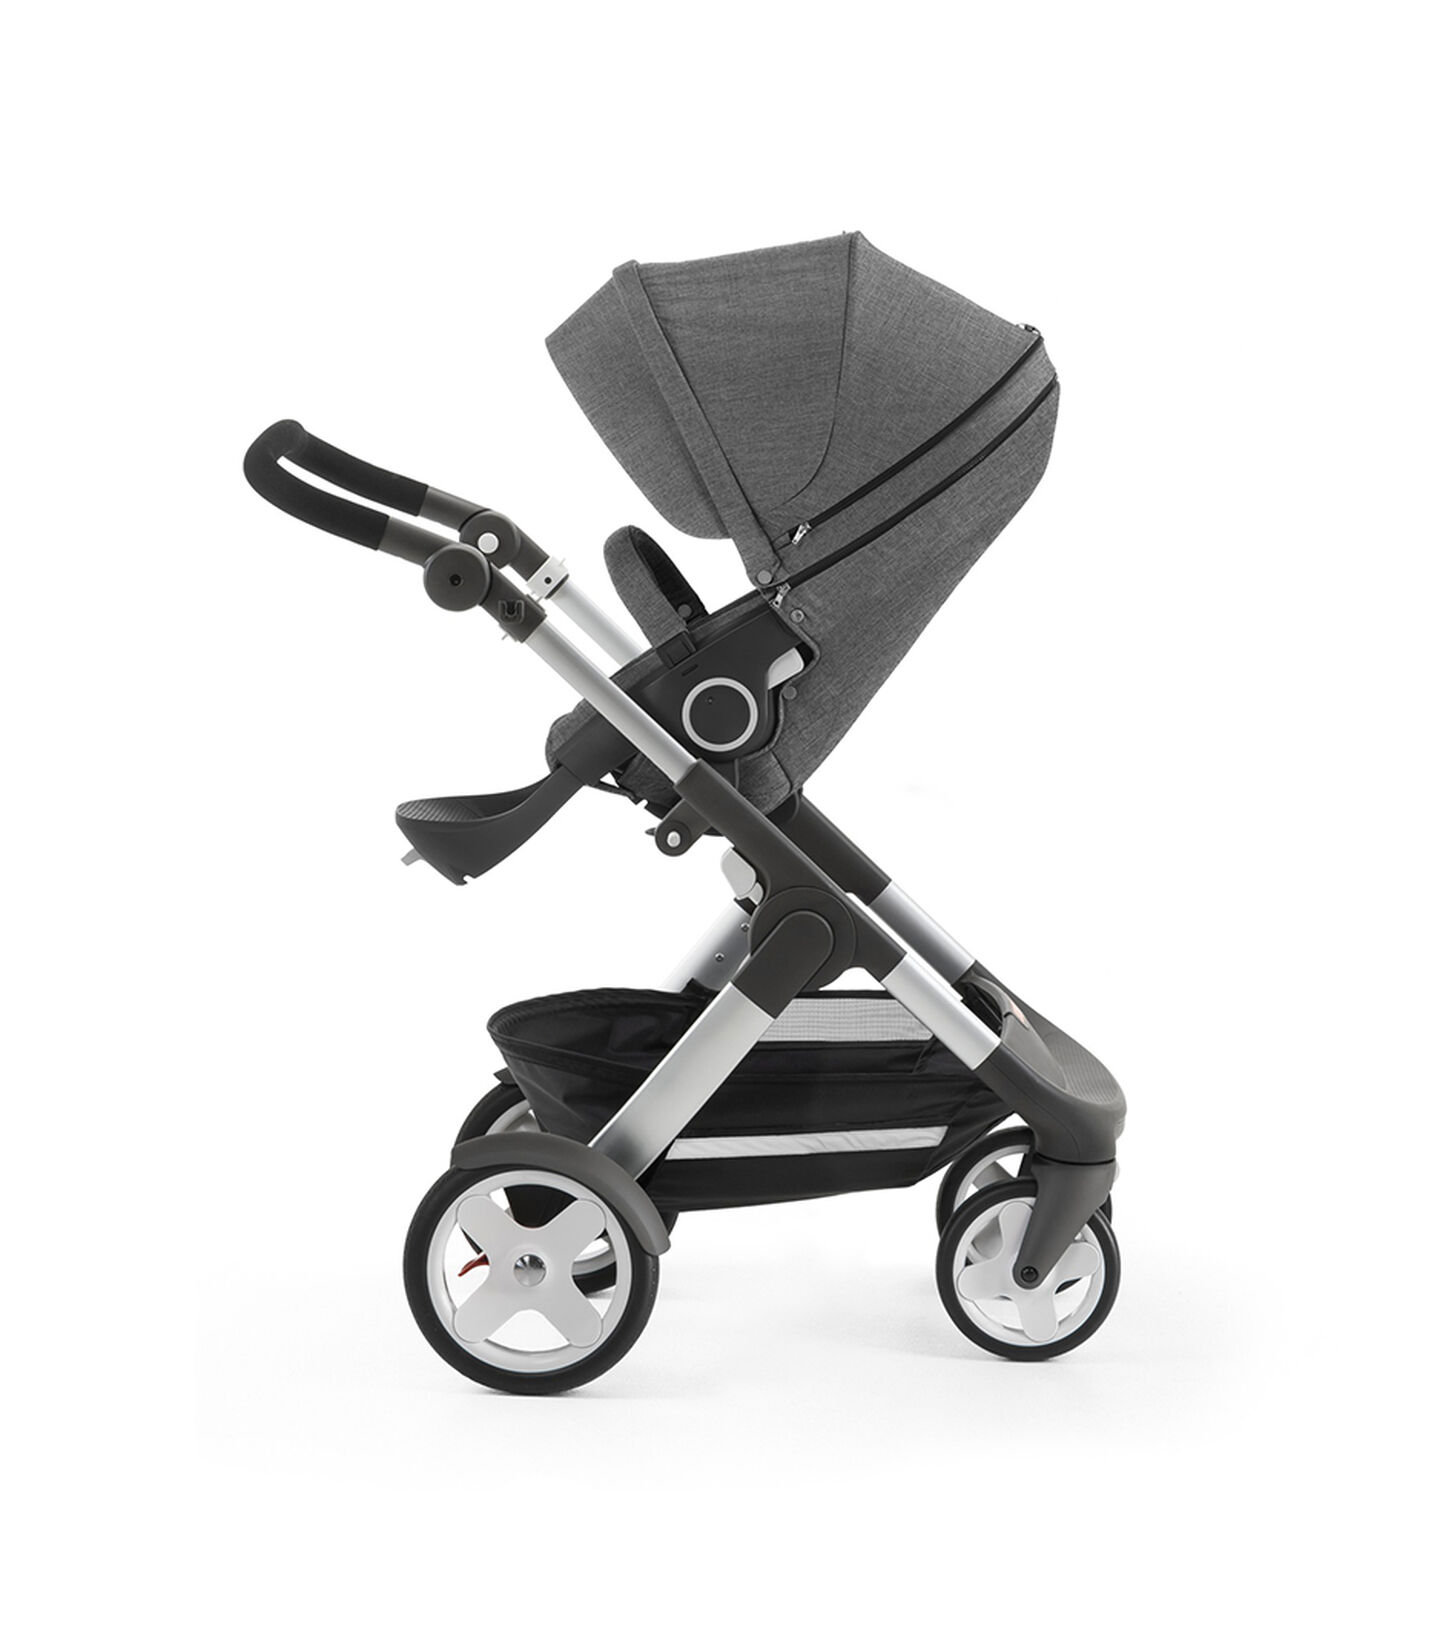 Stokke® Trailz™ with Stokke® Stroller Seat, Black Melange. Classic Wheels. view 1